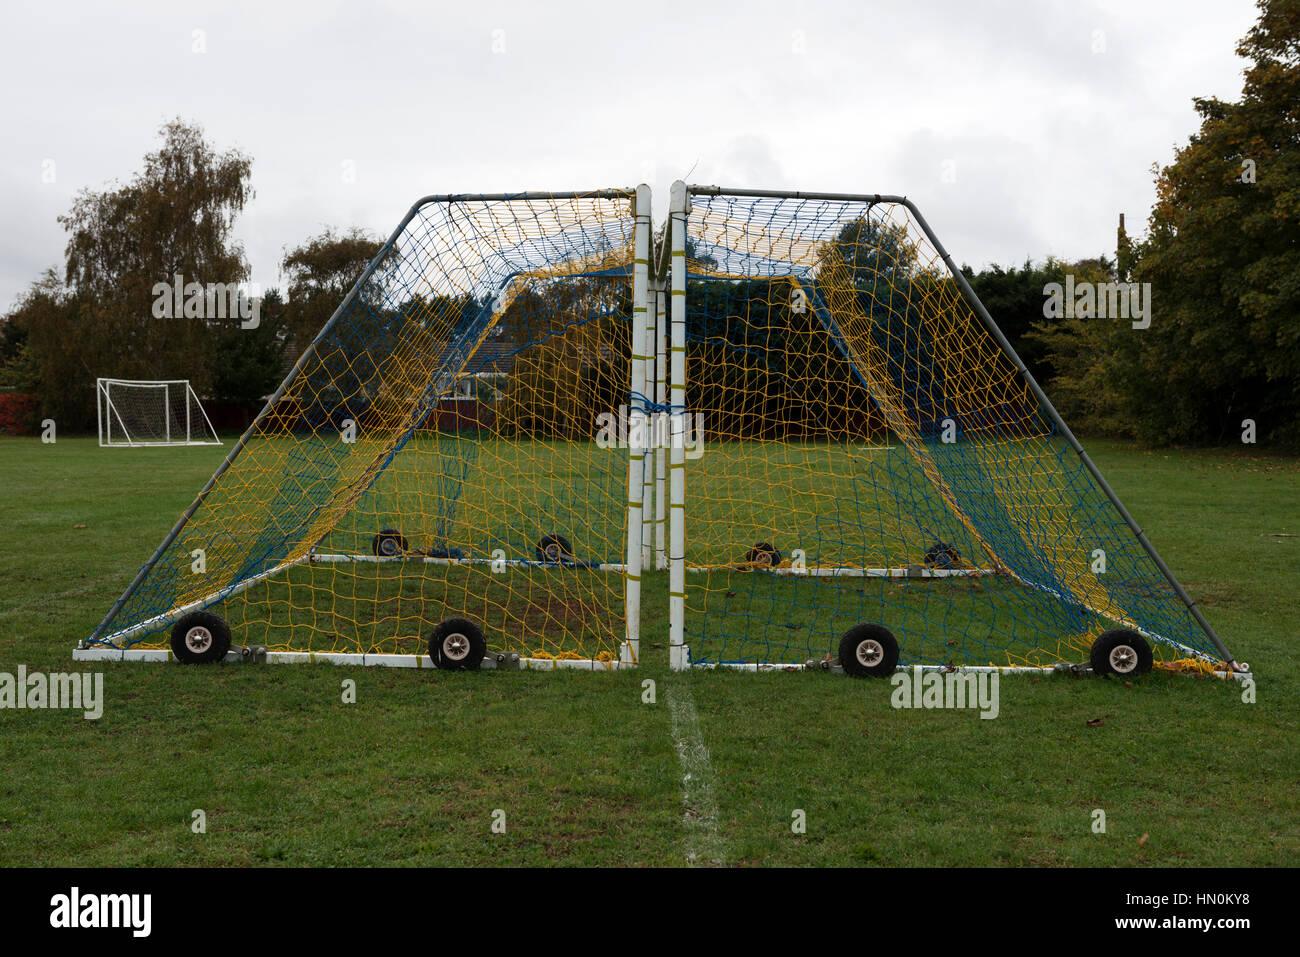 Wheeled football goal posts - Stock Image